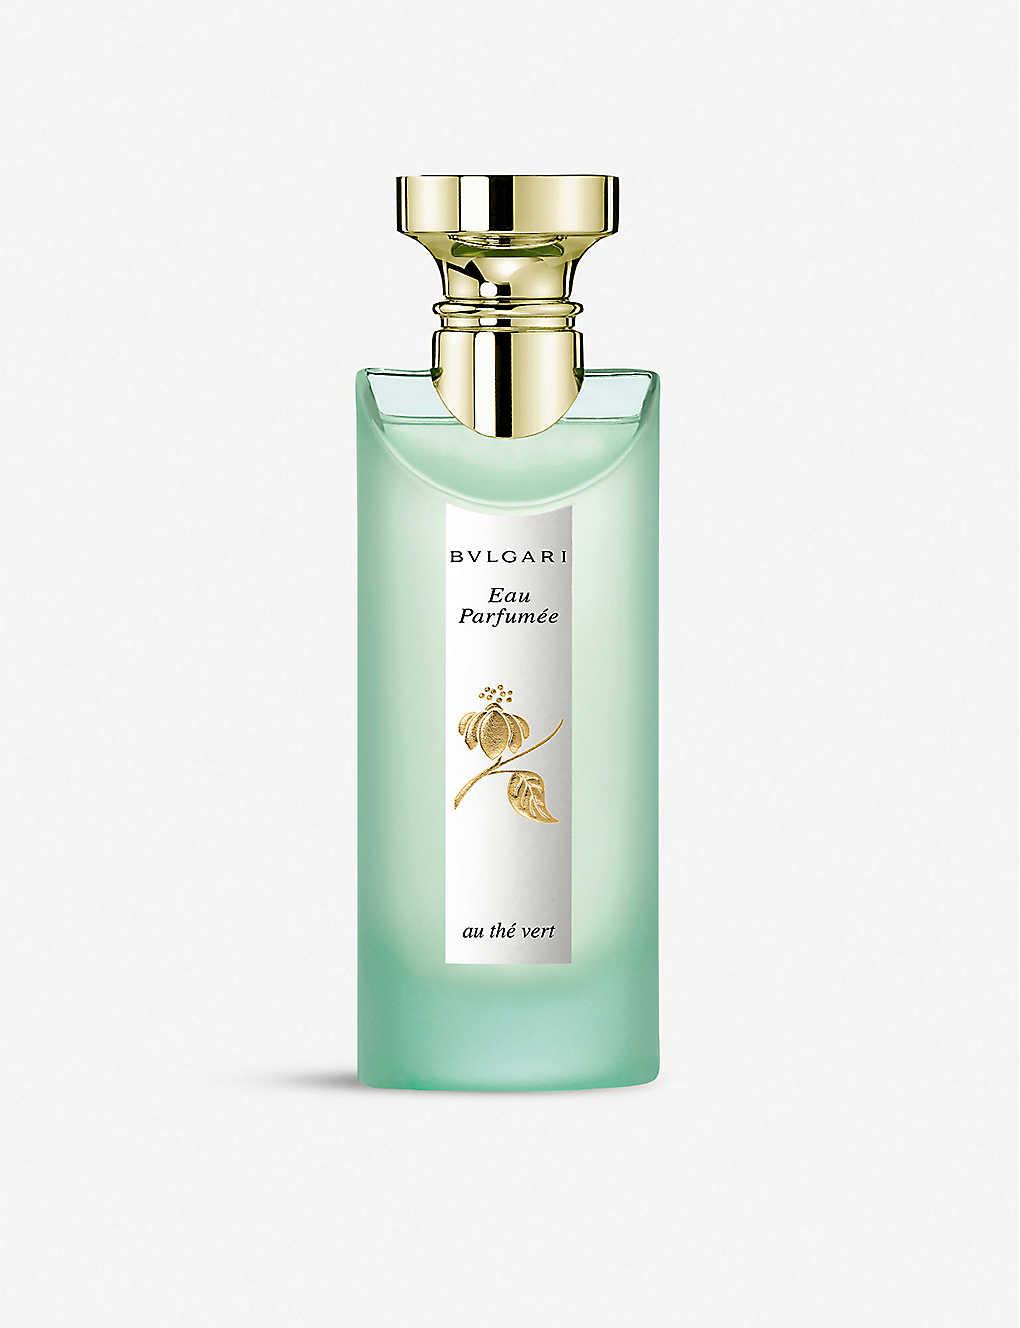 a8faf9c5020 BVLGARI - Eau Parfumée au Thé Vert 75ml